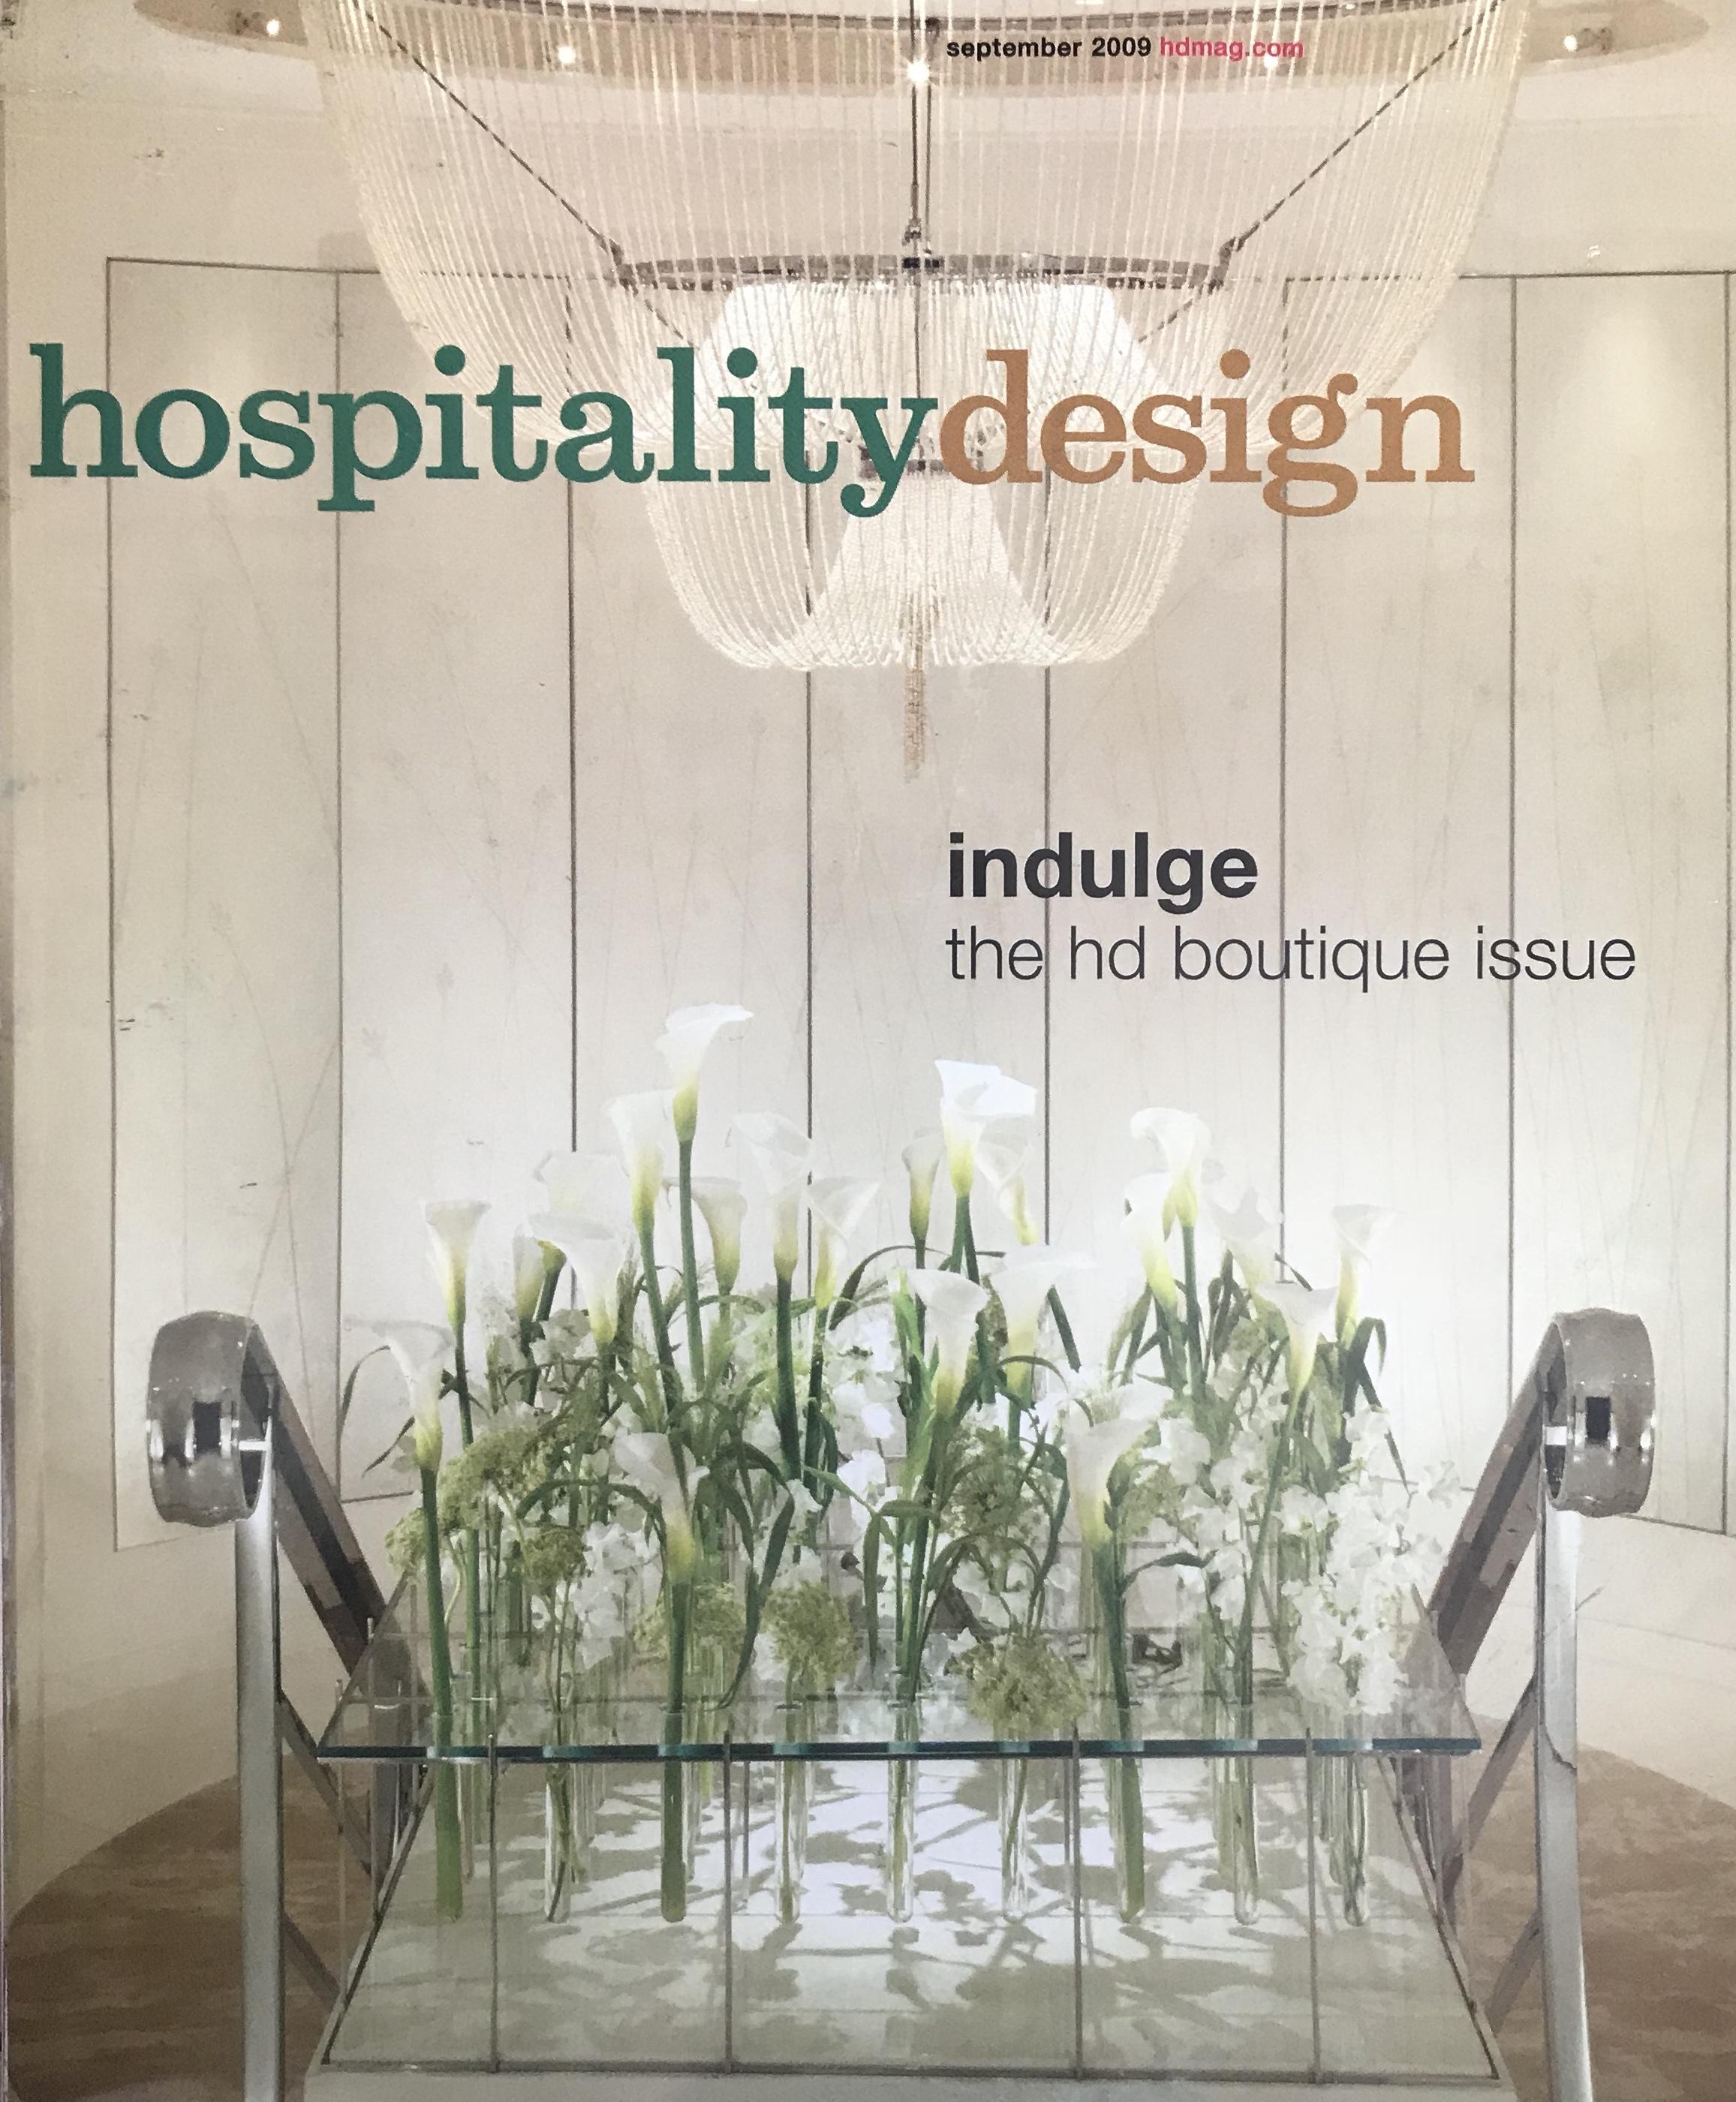 hospitatily design cover.jpg